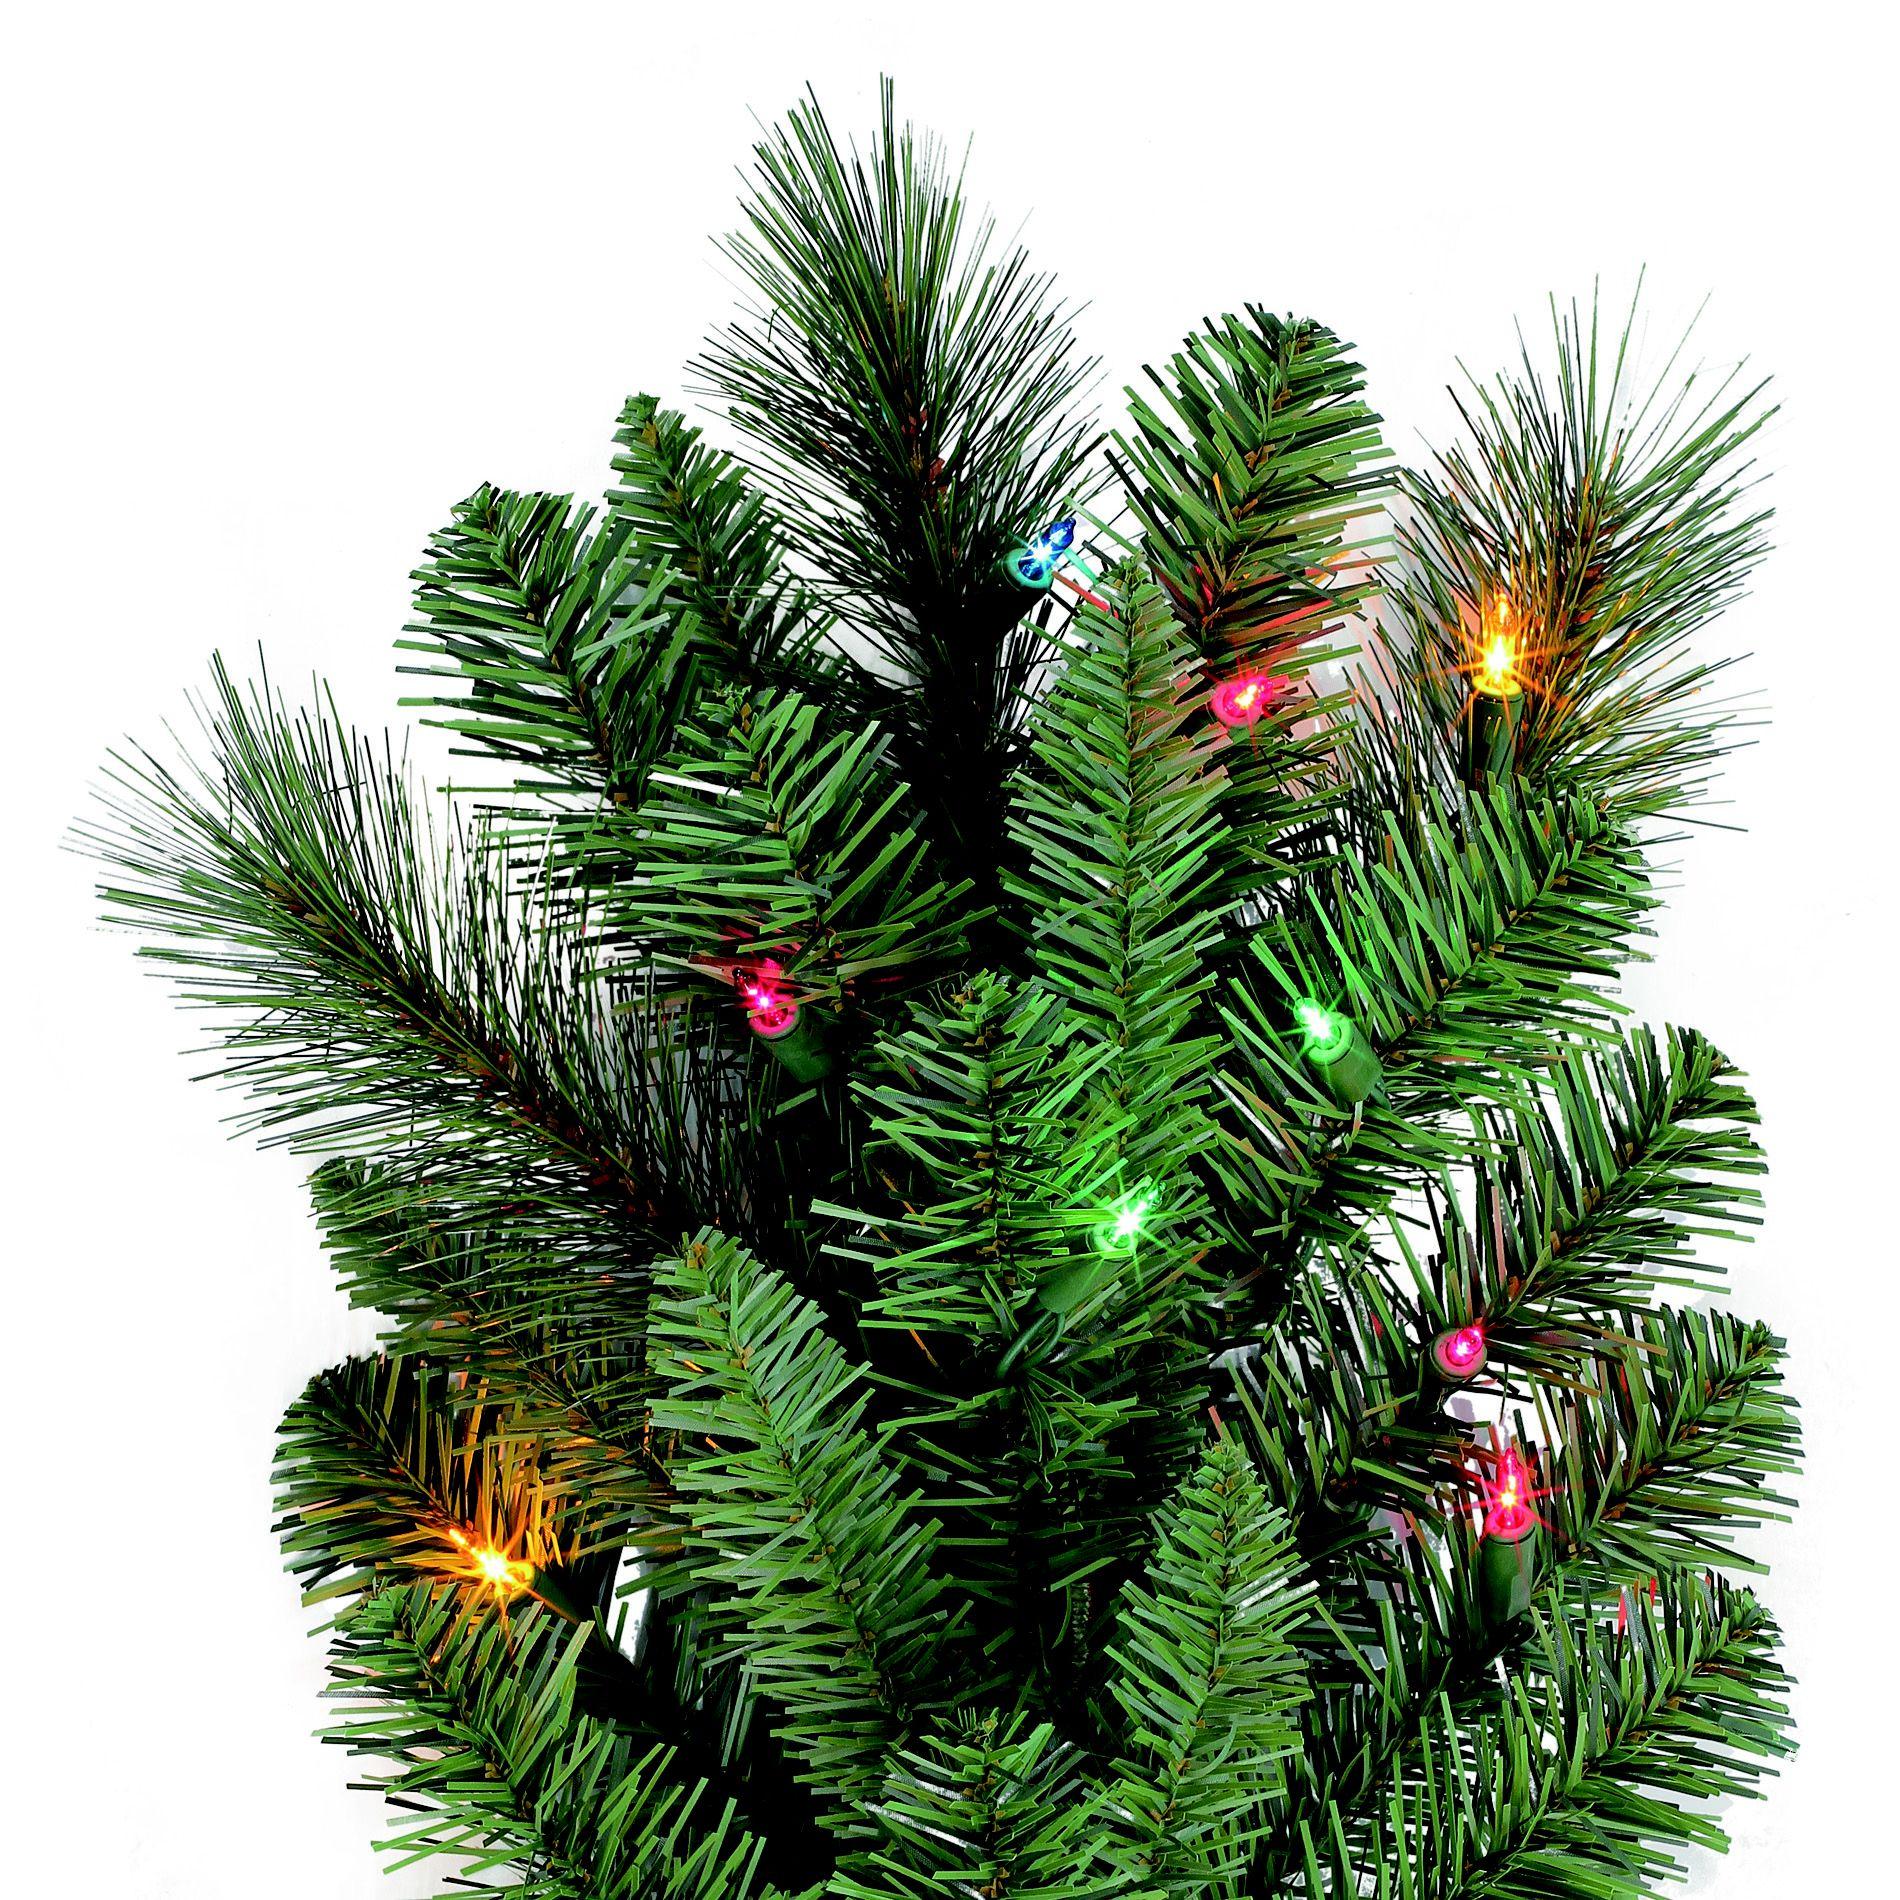 9 Ft Pre-Lit Multi-Colored Light Aspen Mountain Slim Pine Artificial Christmas Tree